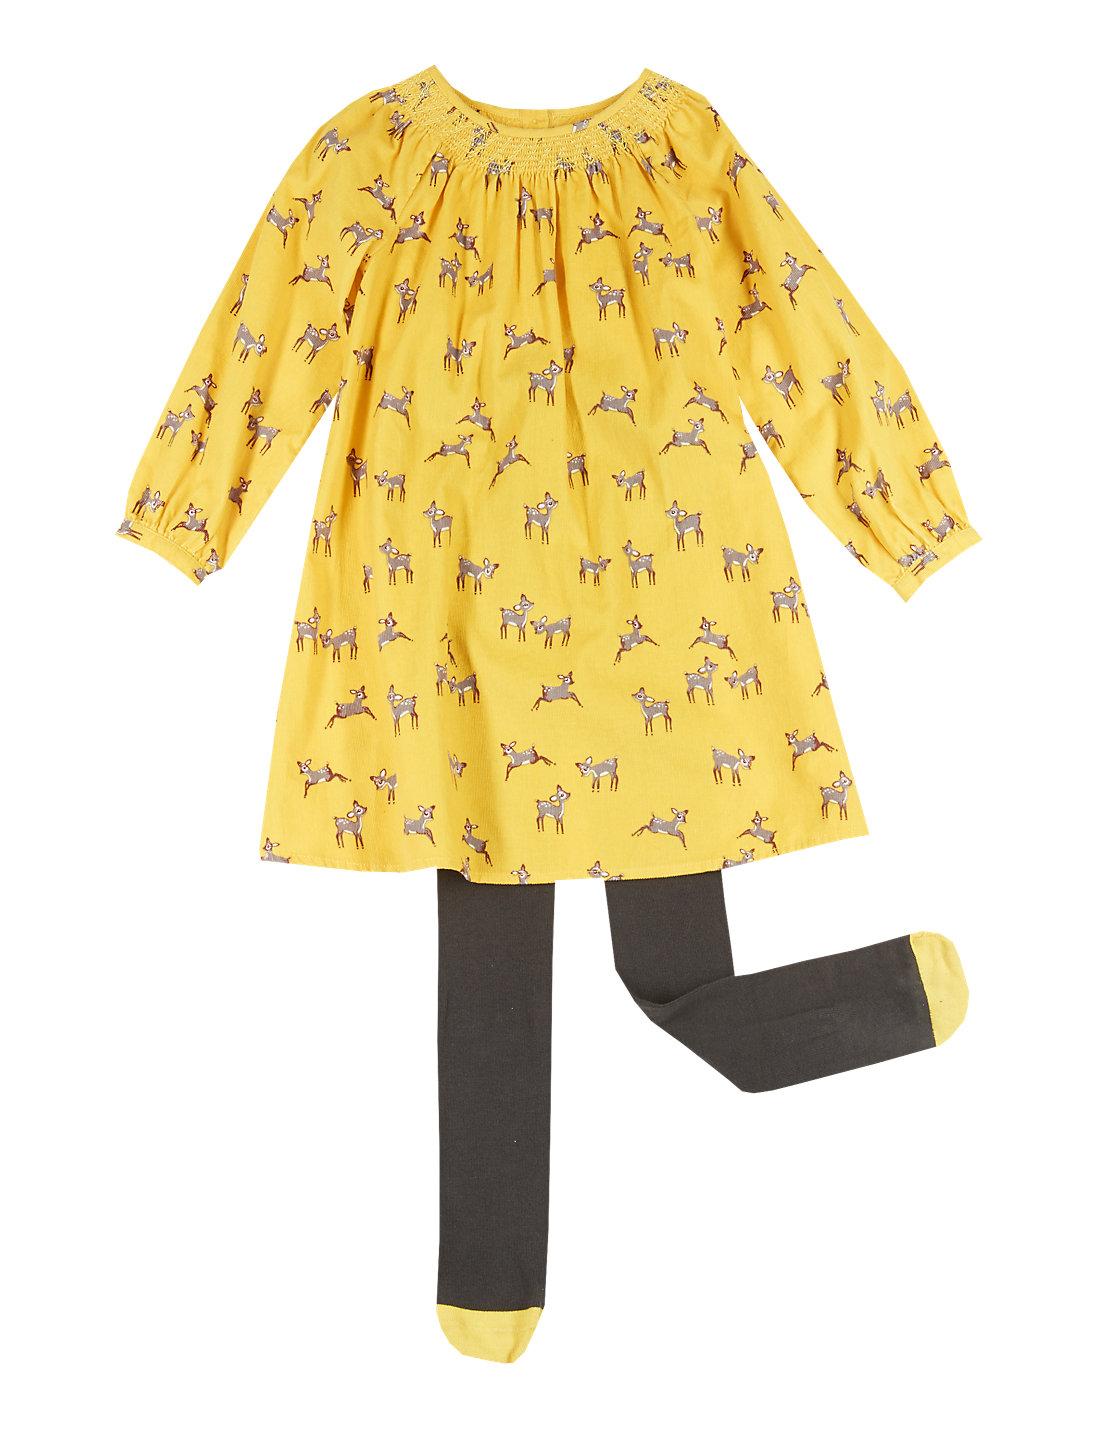 2 piece cotton rich deer print corduroy dress u0026 tights 1 7 y